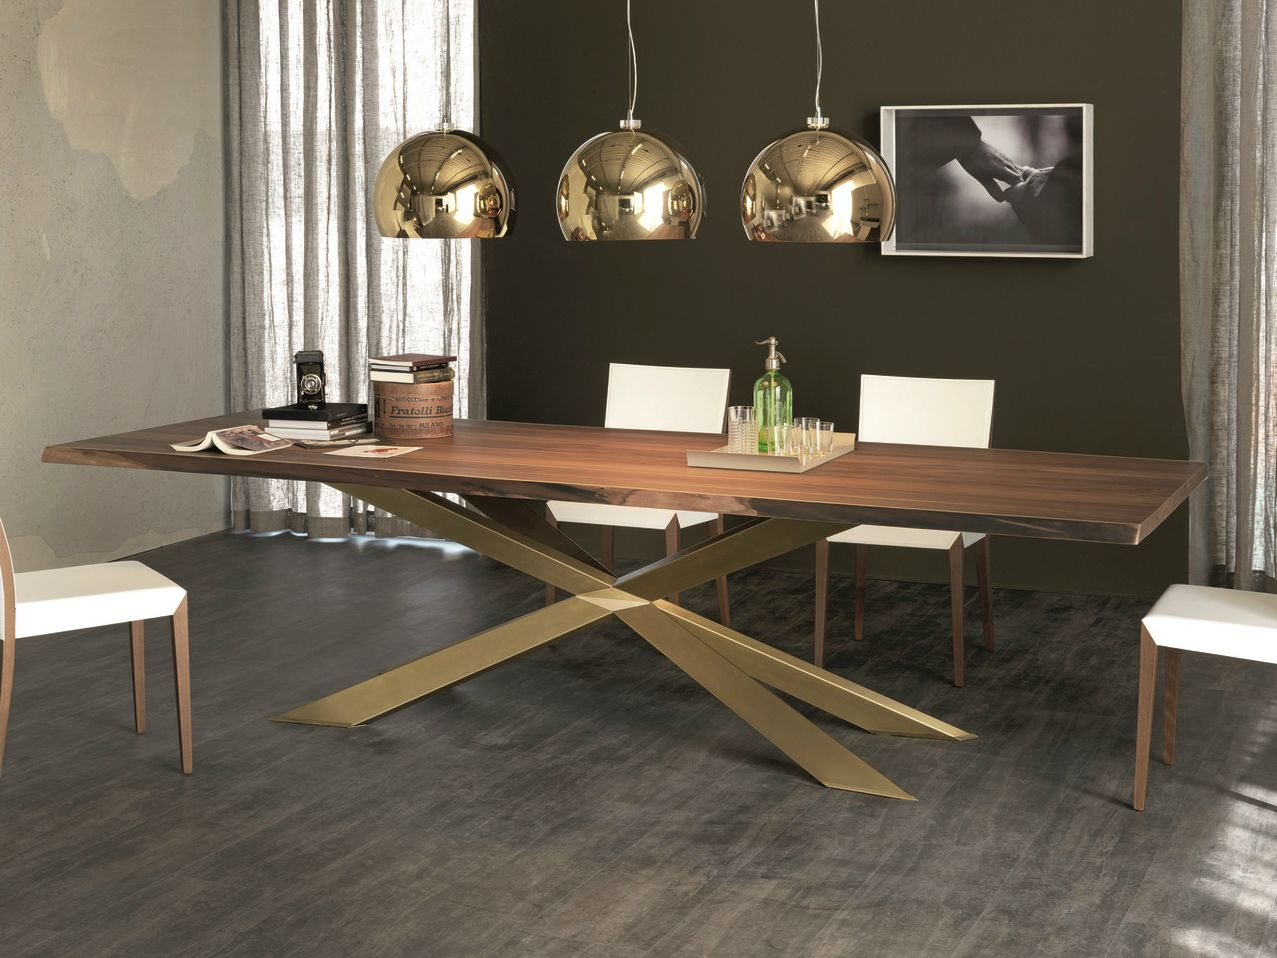 Spyder Tavolo ~ Tavolo rettangolare in legno spyder wood by cattelan italia design